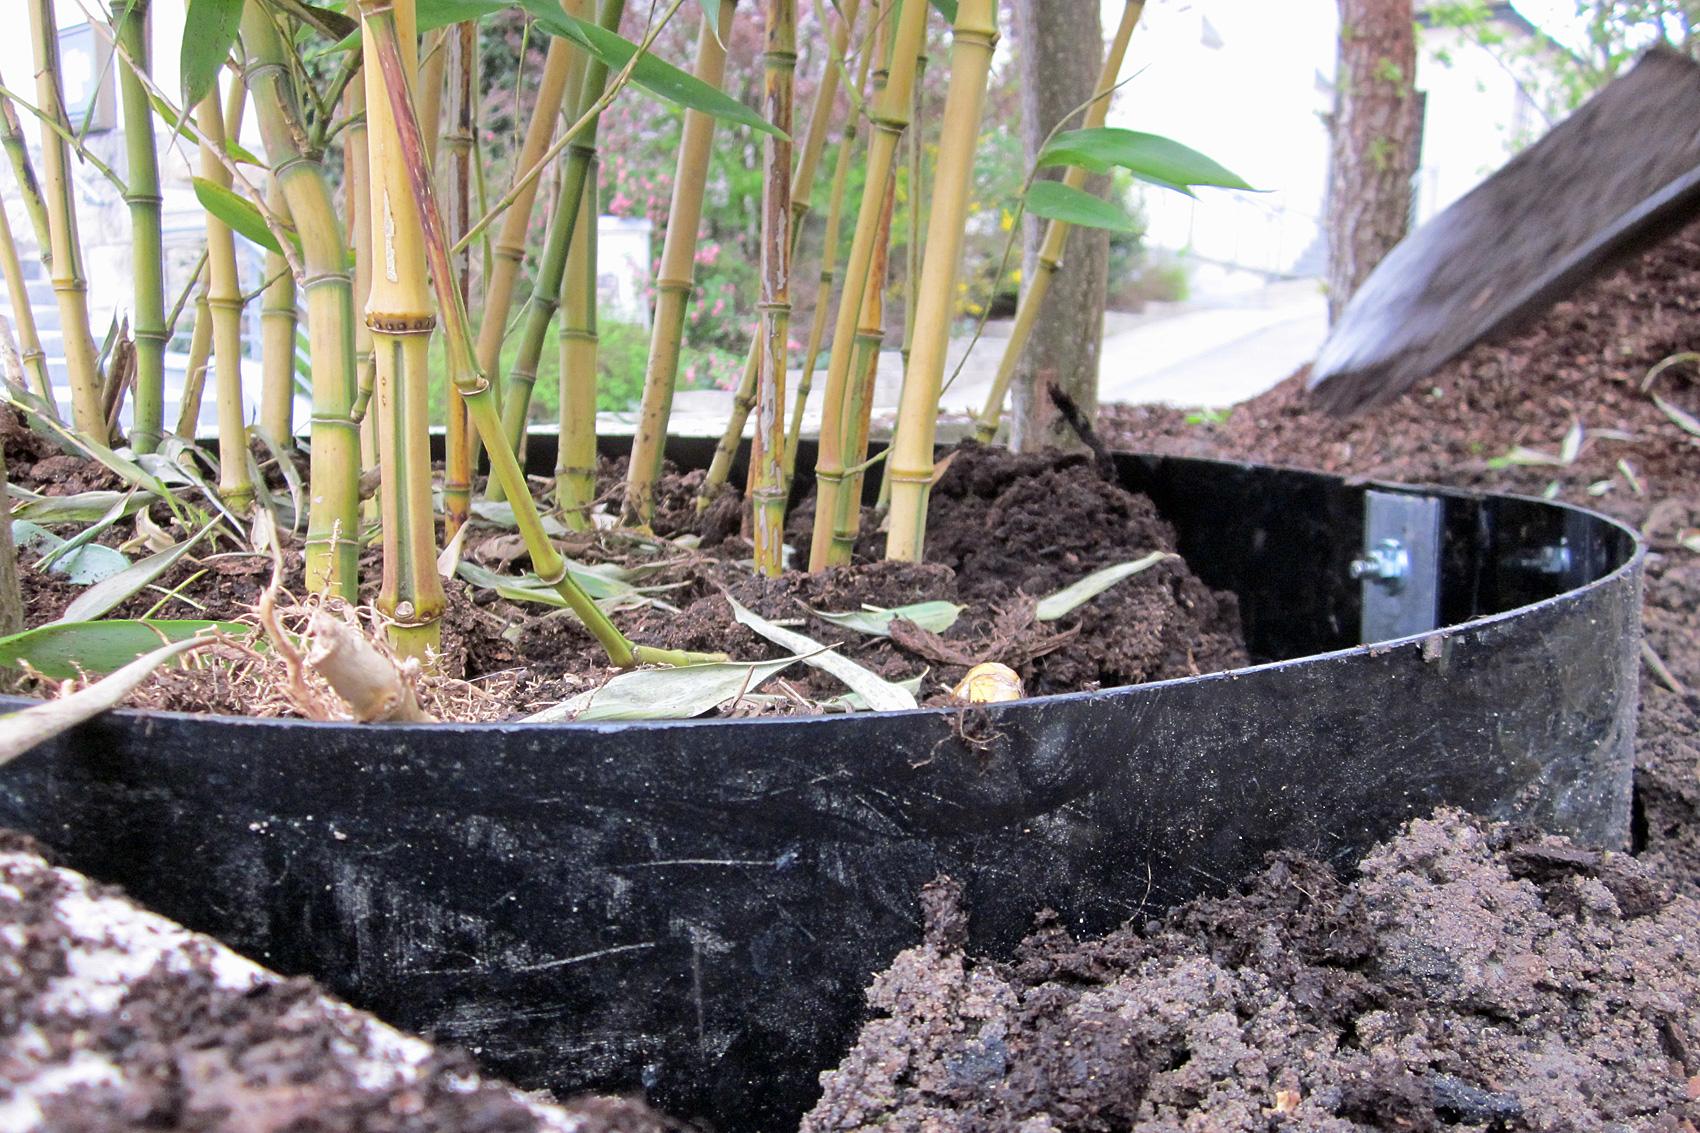 gartentipp rhizomsperre und wurzelsperre native plants. Black Bedroom Furniture Sets. Home Design Ideas